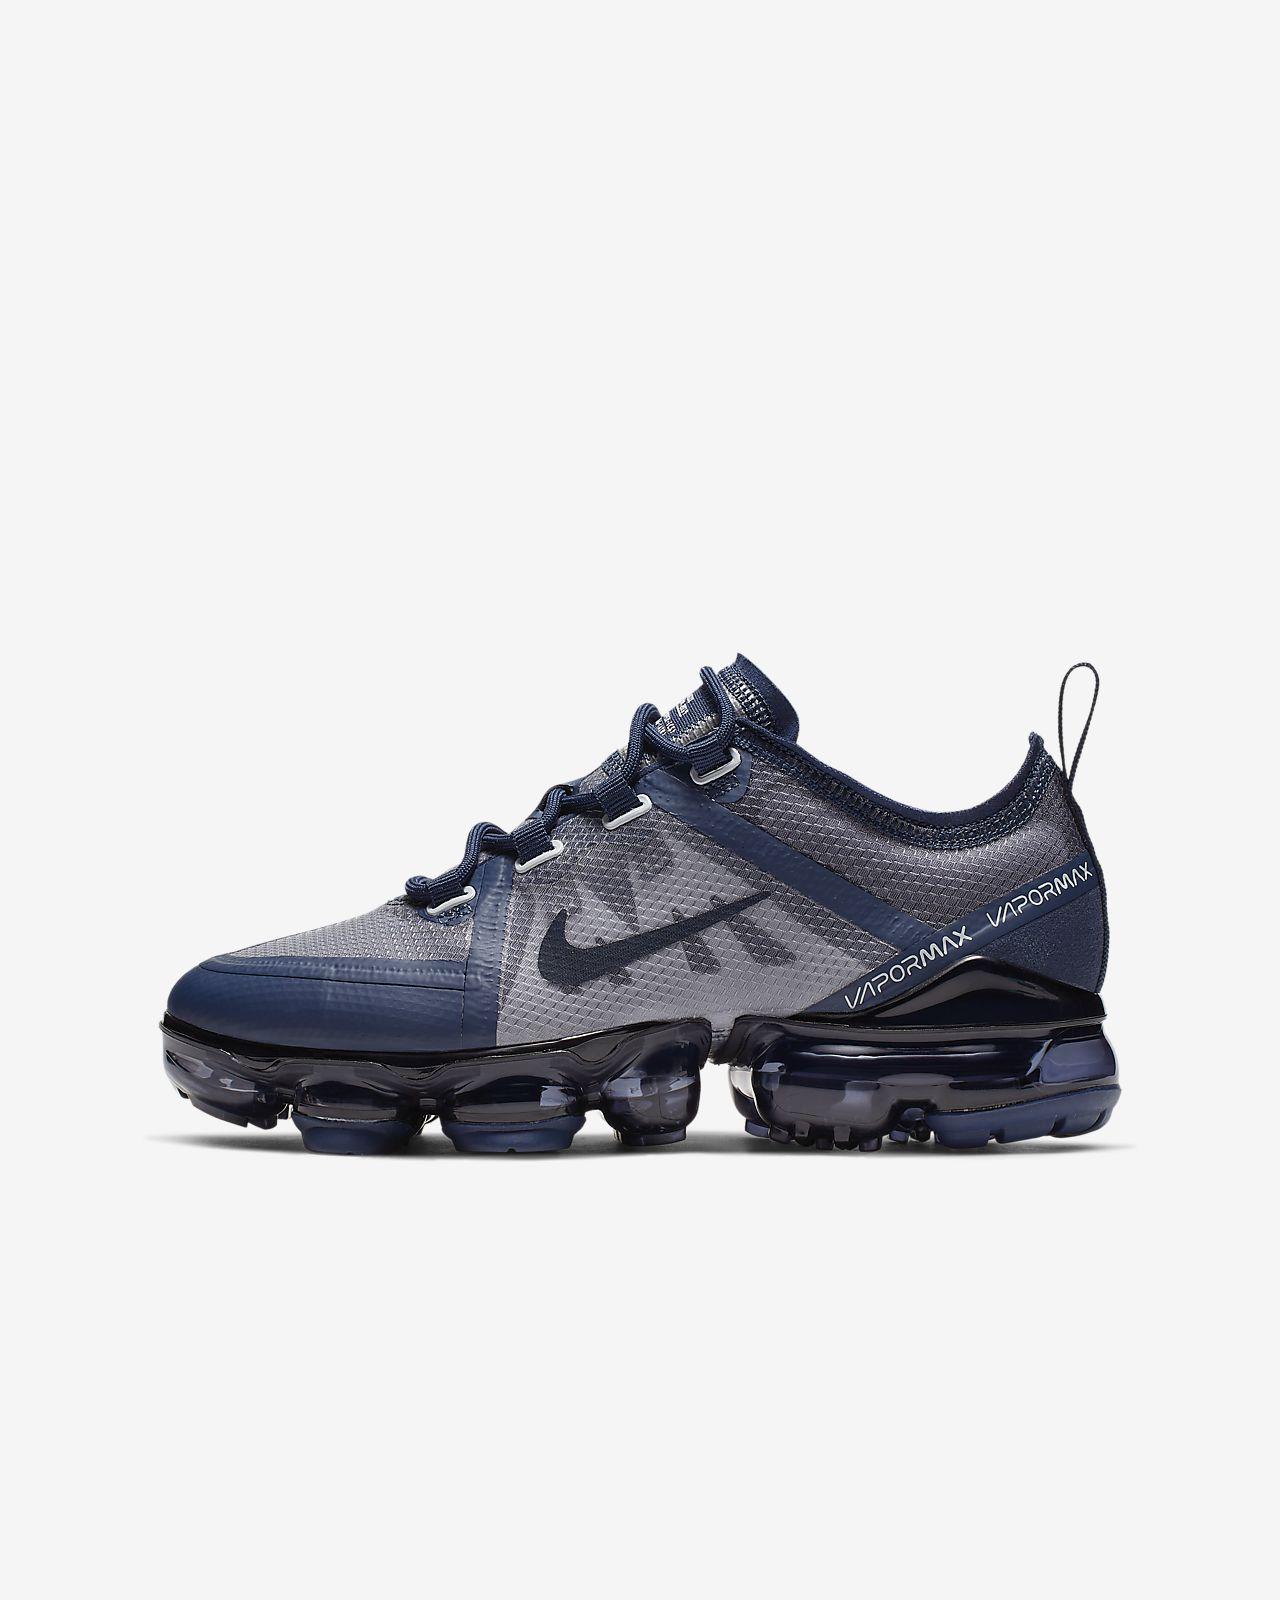 e3e6d37c3f8aa Nike Air VaporMax 2019 Older Kids  Shoe. Nike.com GB